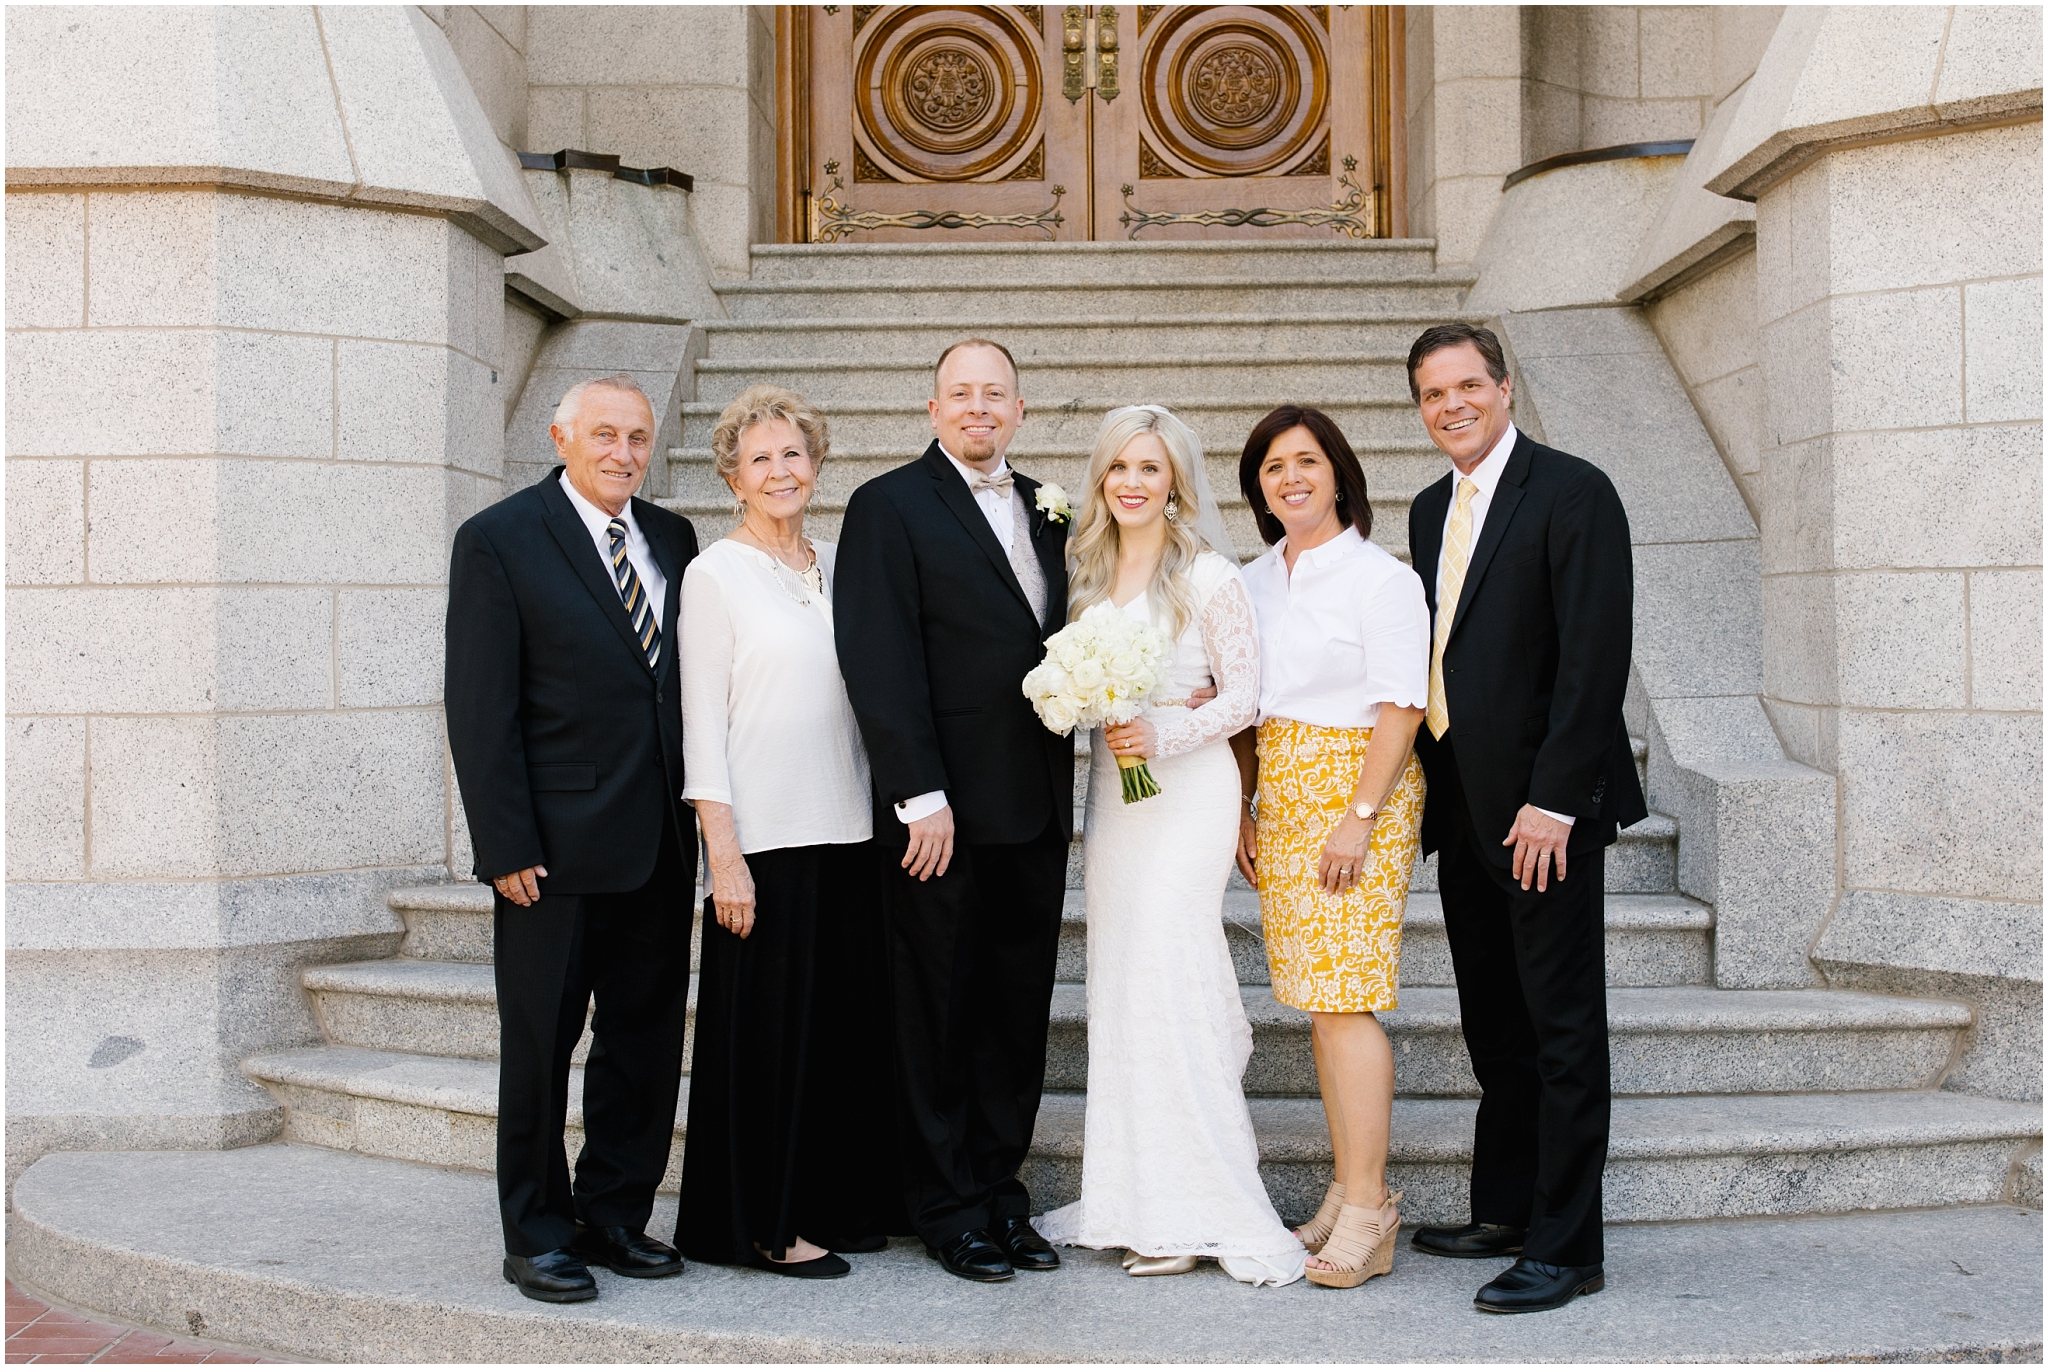 CherylandTyler-95_Lizzie-B-Imagery-Utah-Wedding-Photographer-Salt-Lake-City-Temple-Wells-Fargo-Building-Reception.jpg